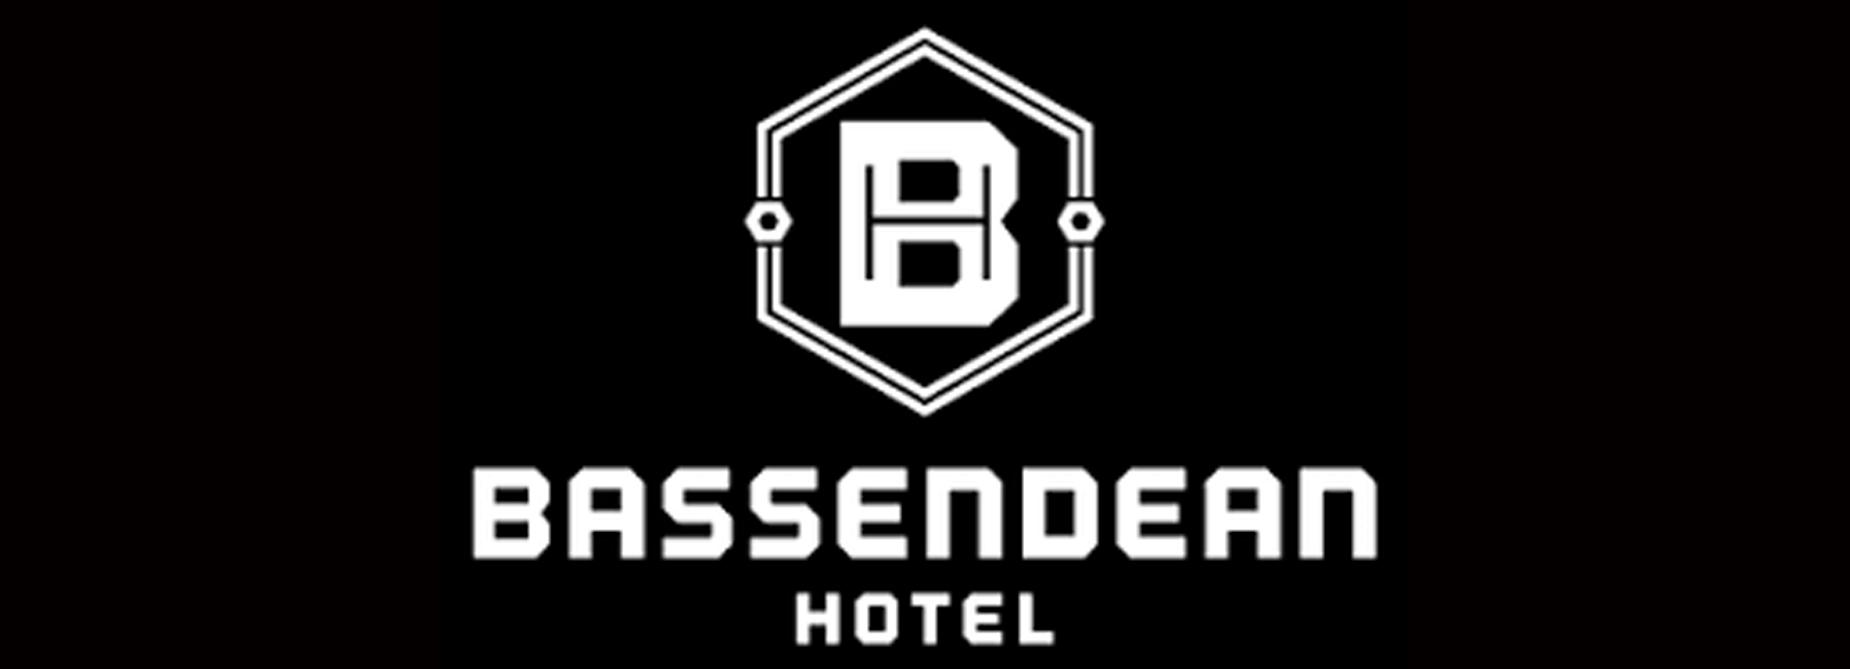 The Basso Logo